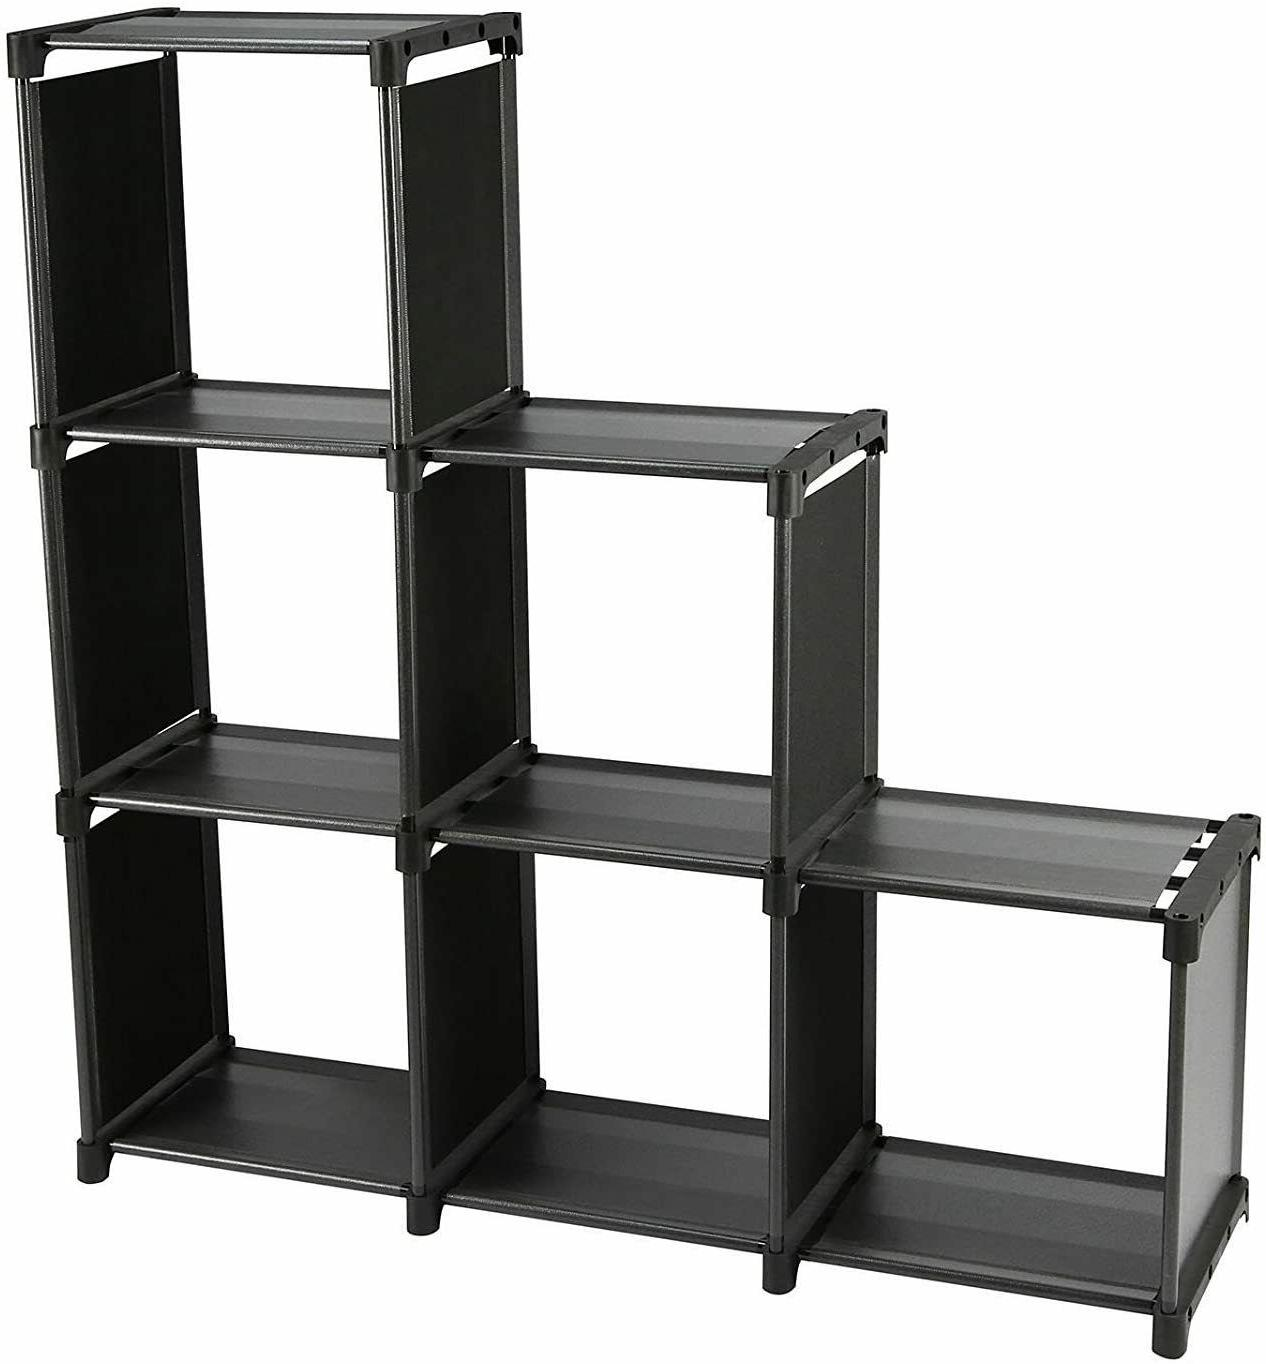 3 tiers 6 cubes storage cabinet closet